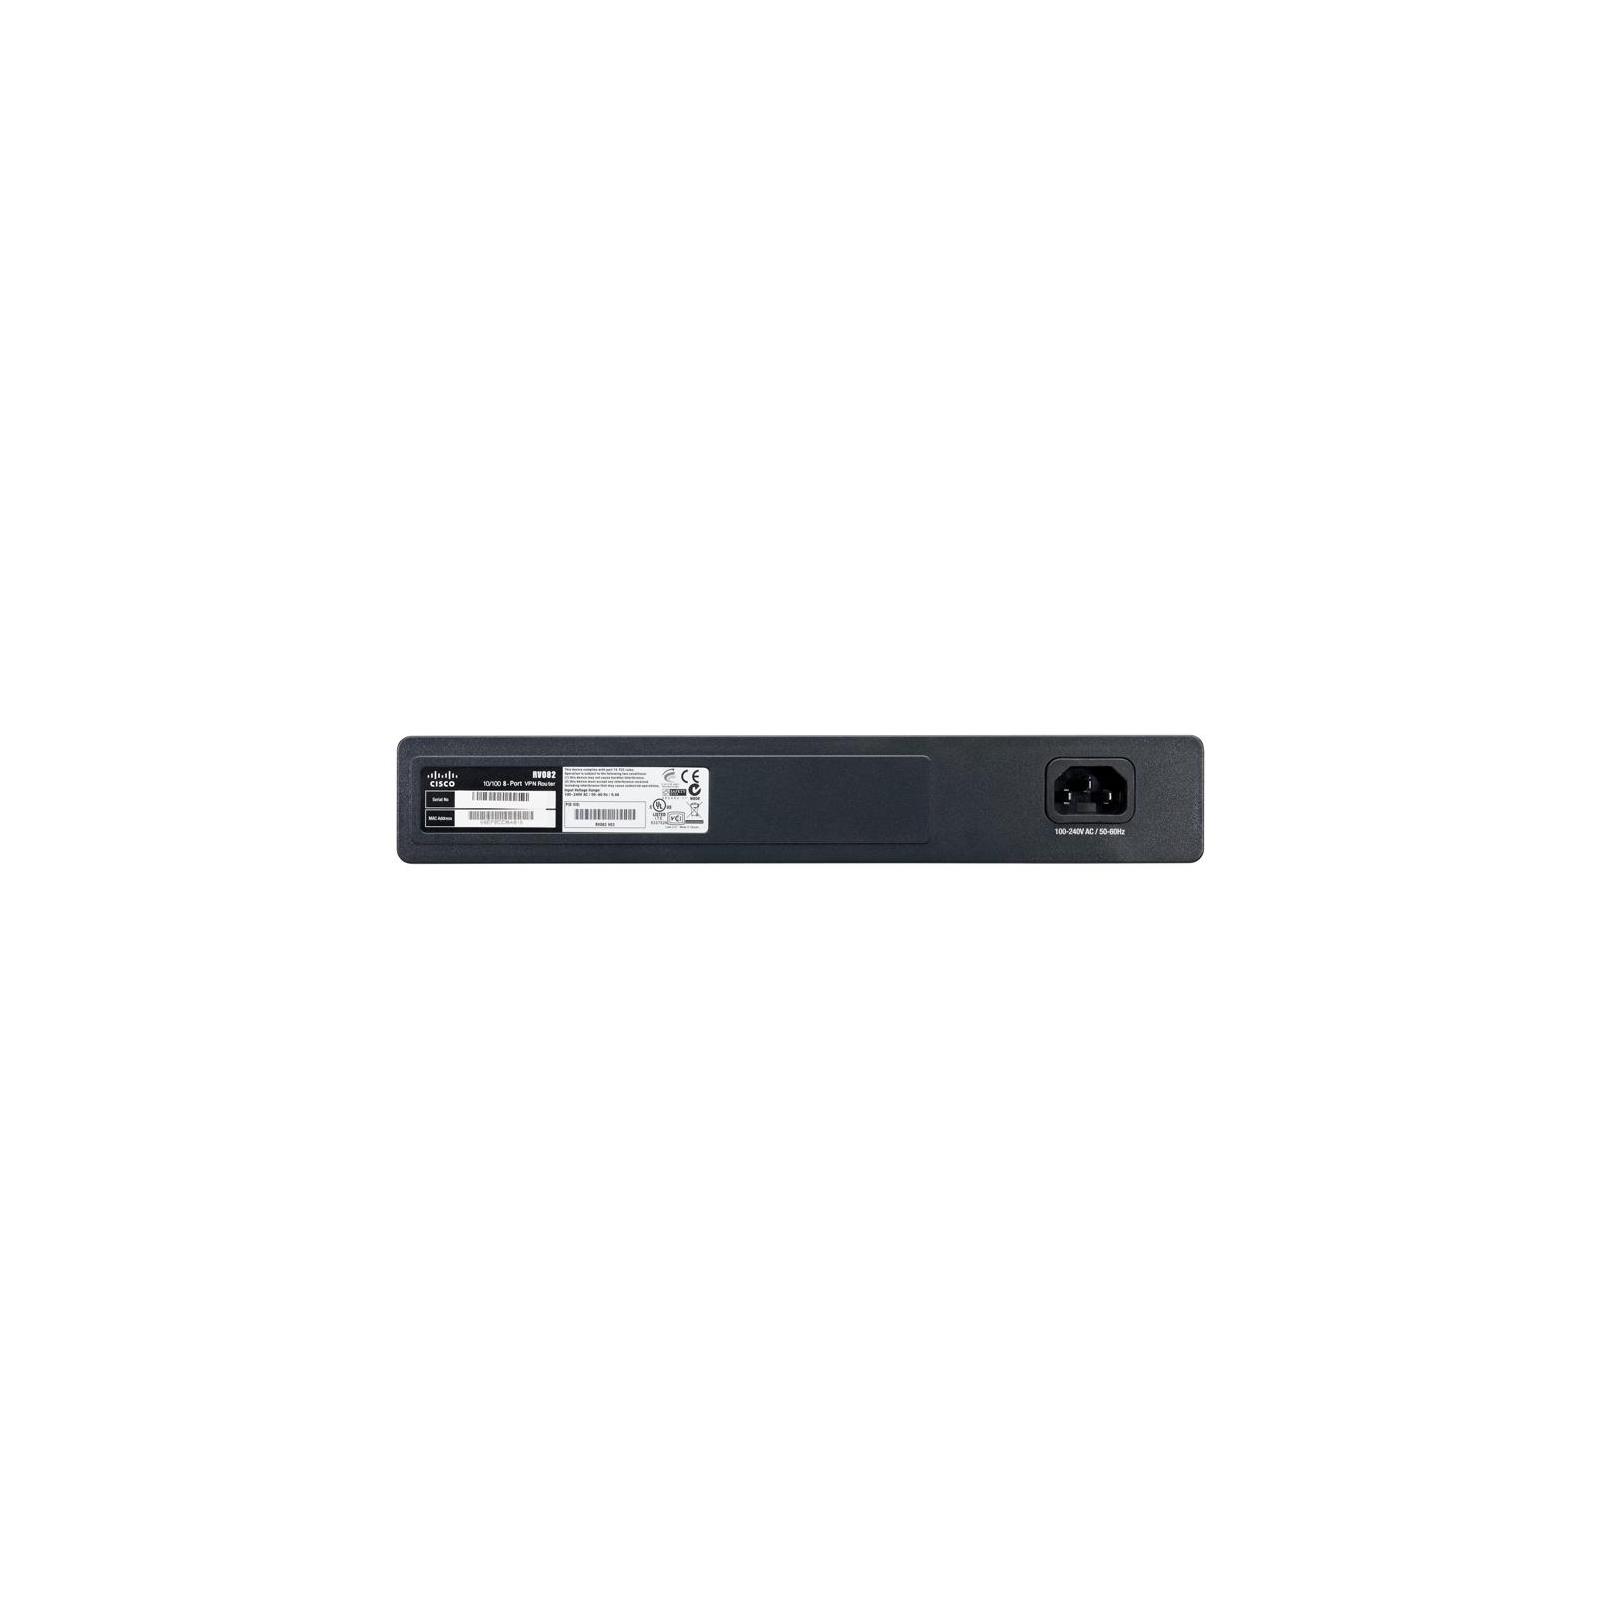 Маршрутизатор Cisco RV082 (RV082-EU) изображение 2